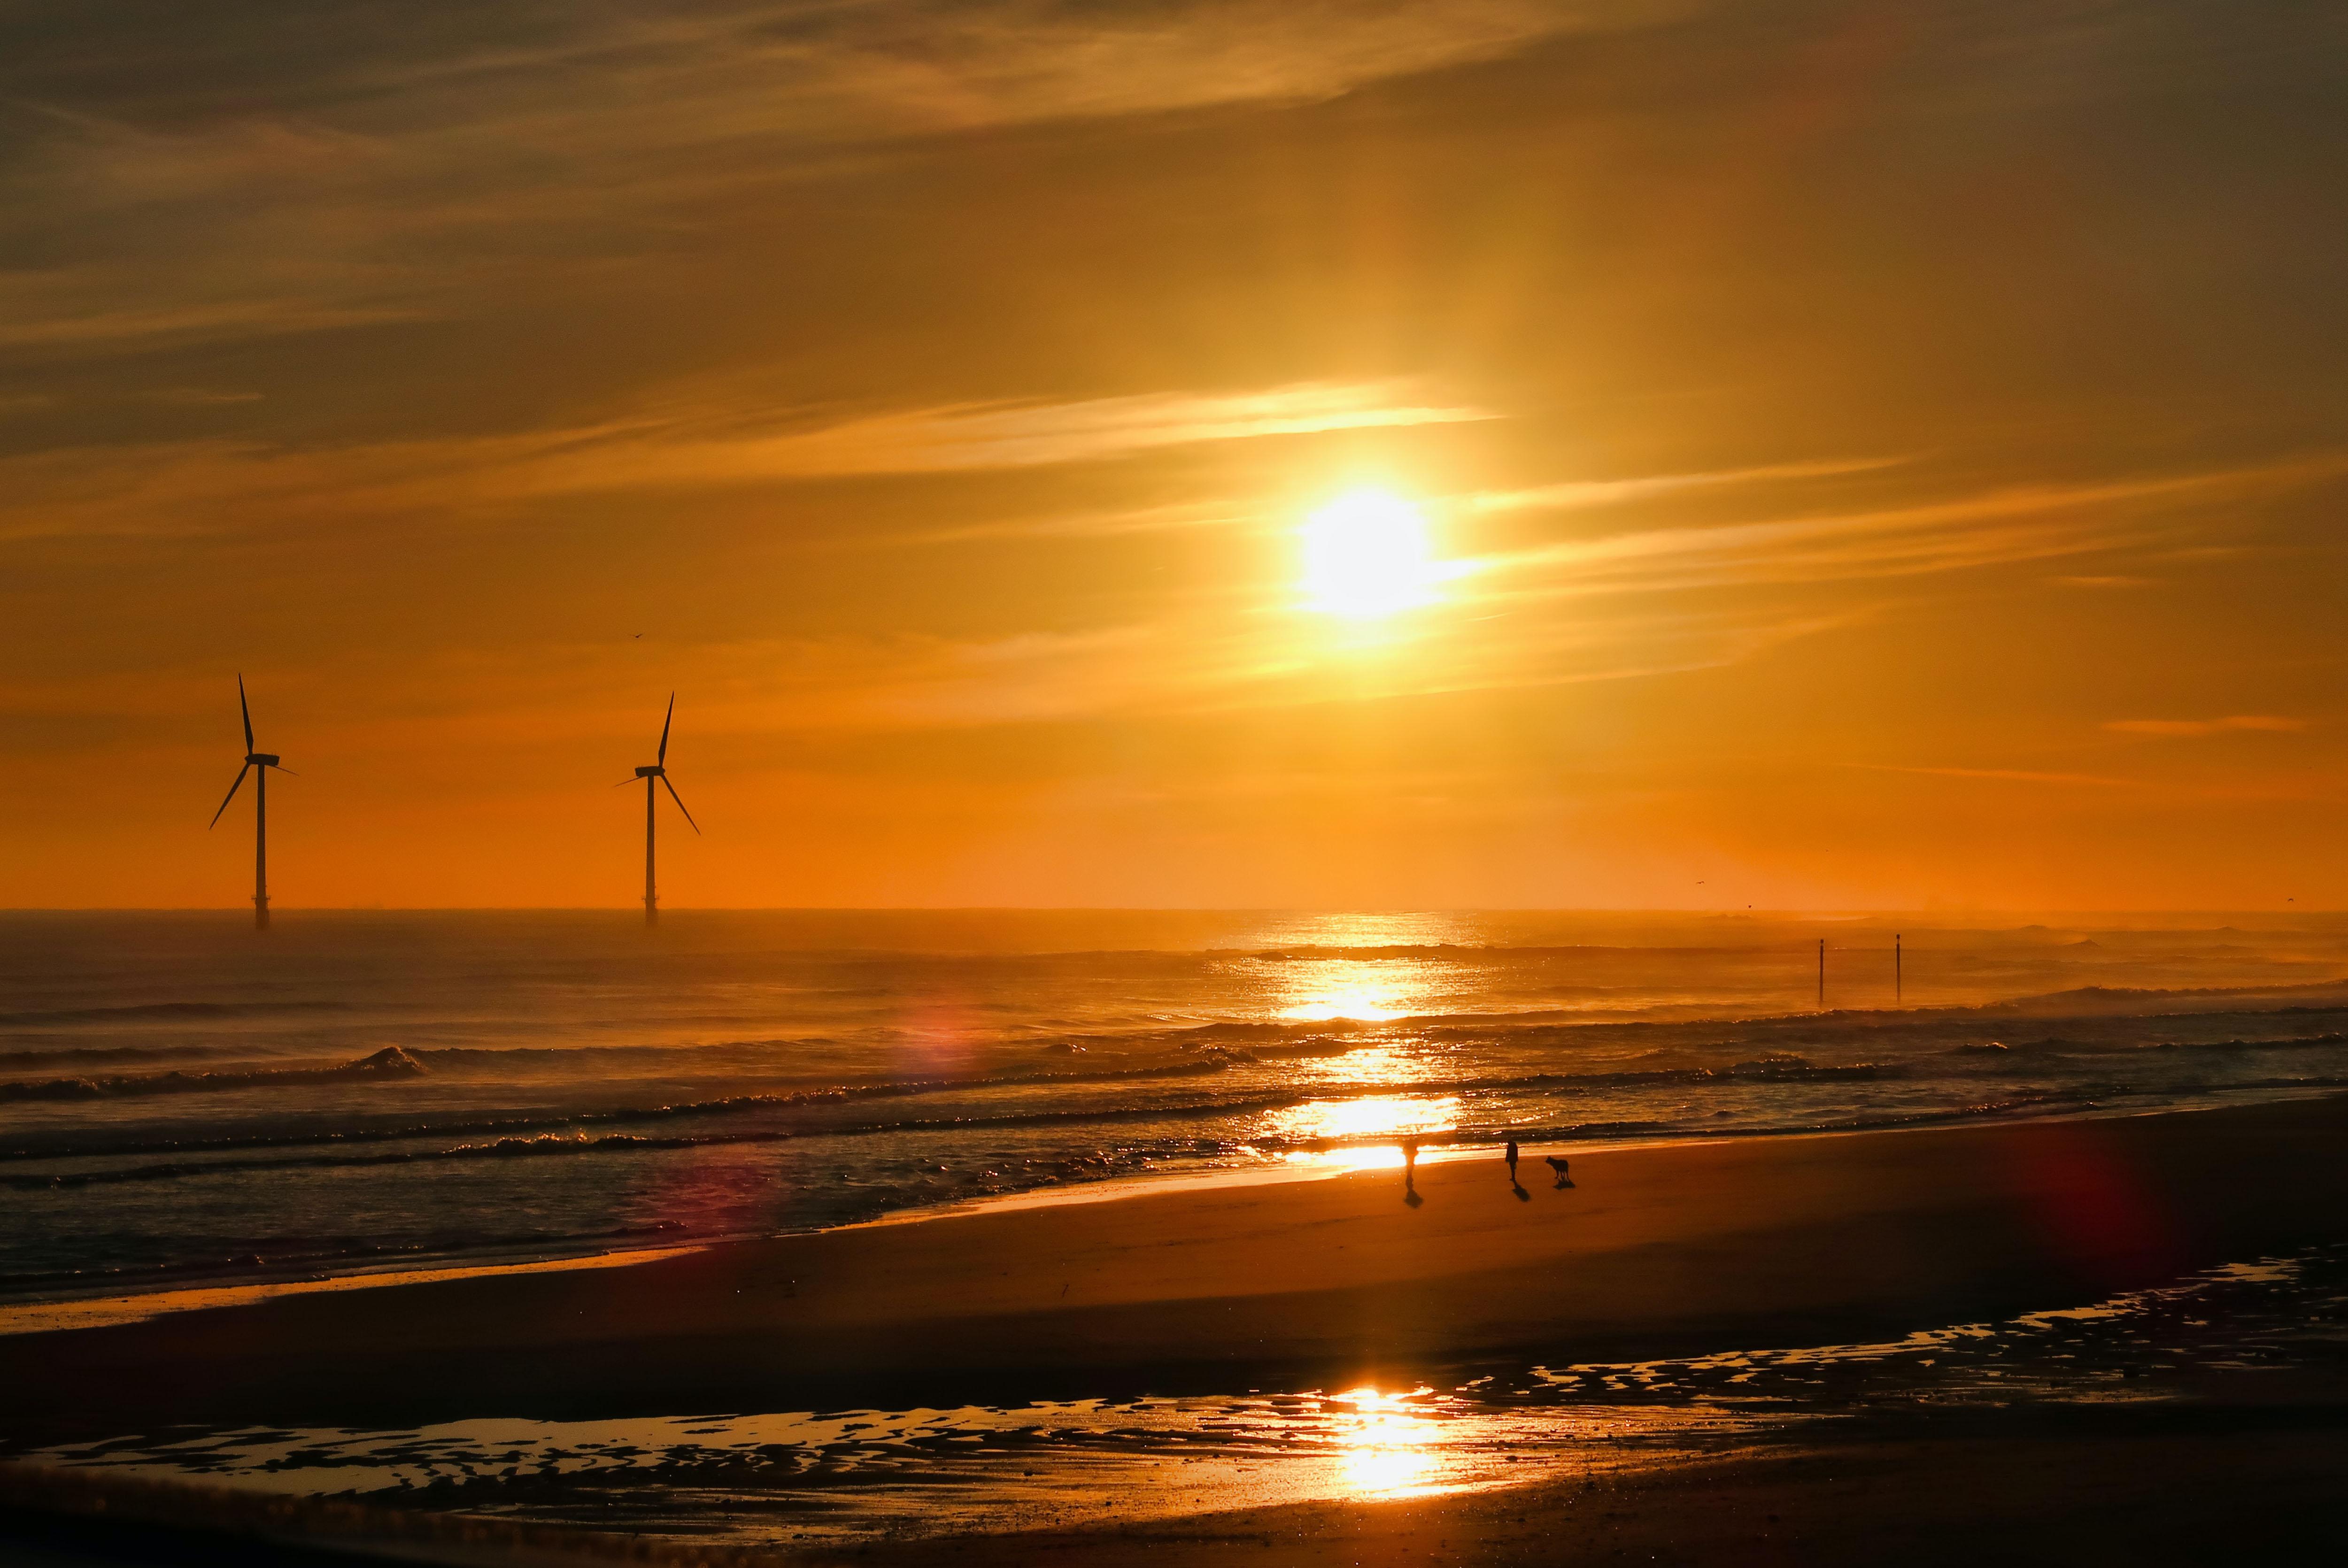 Stijging duurzame energieproductie